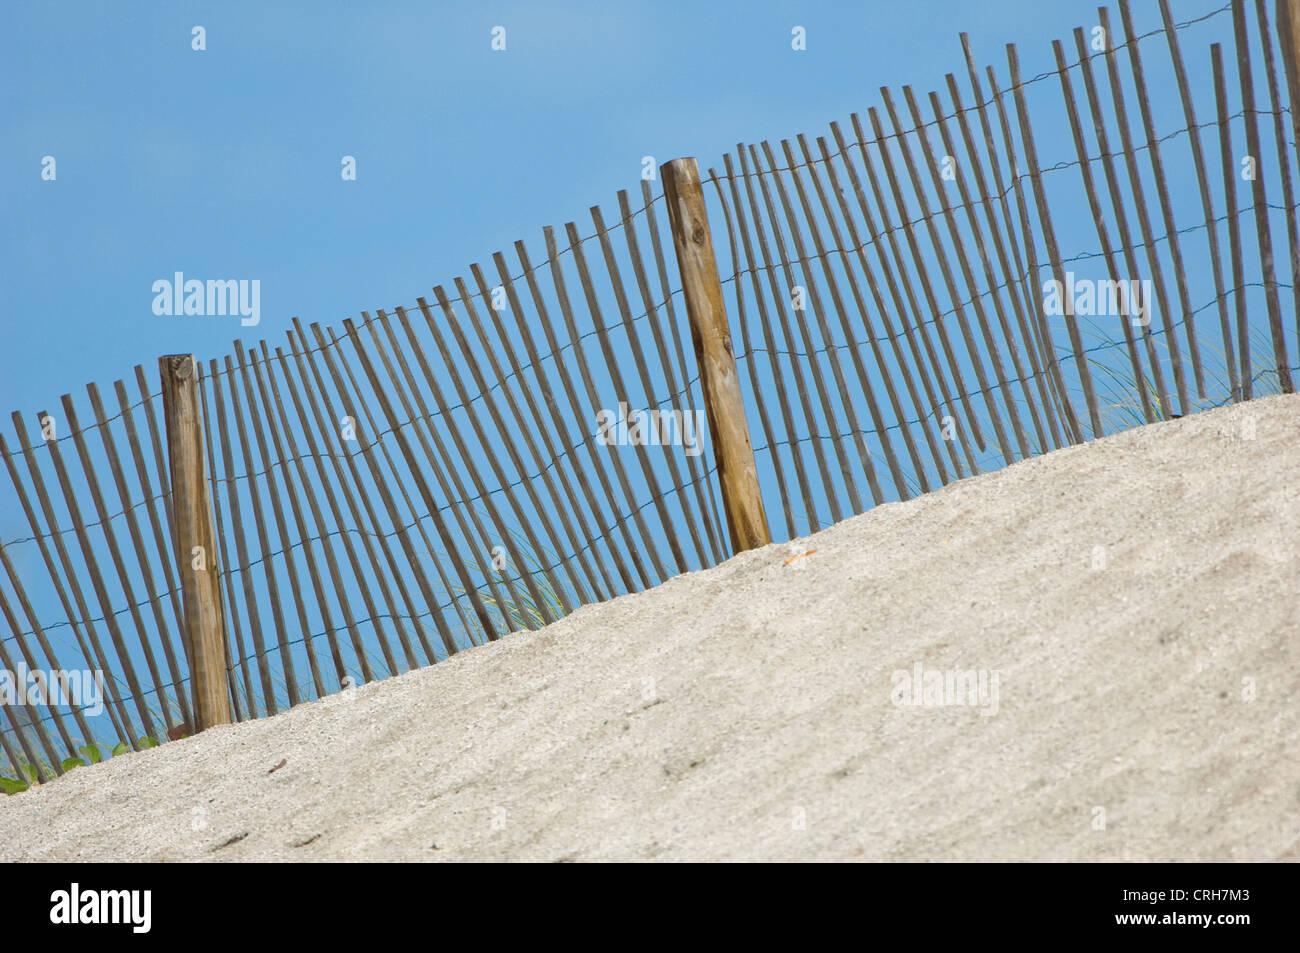 beach dune fence - Stock Image